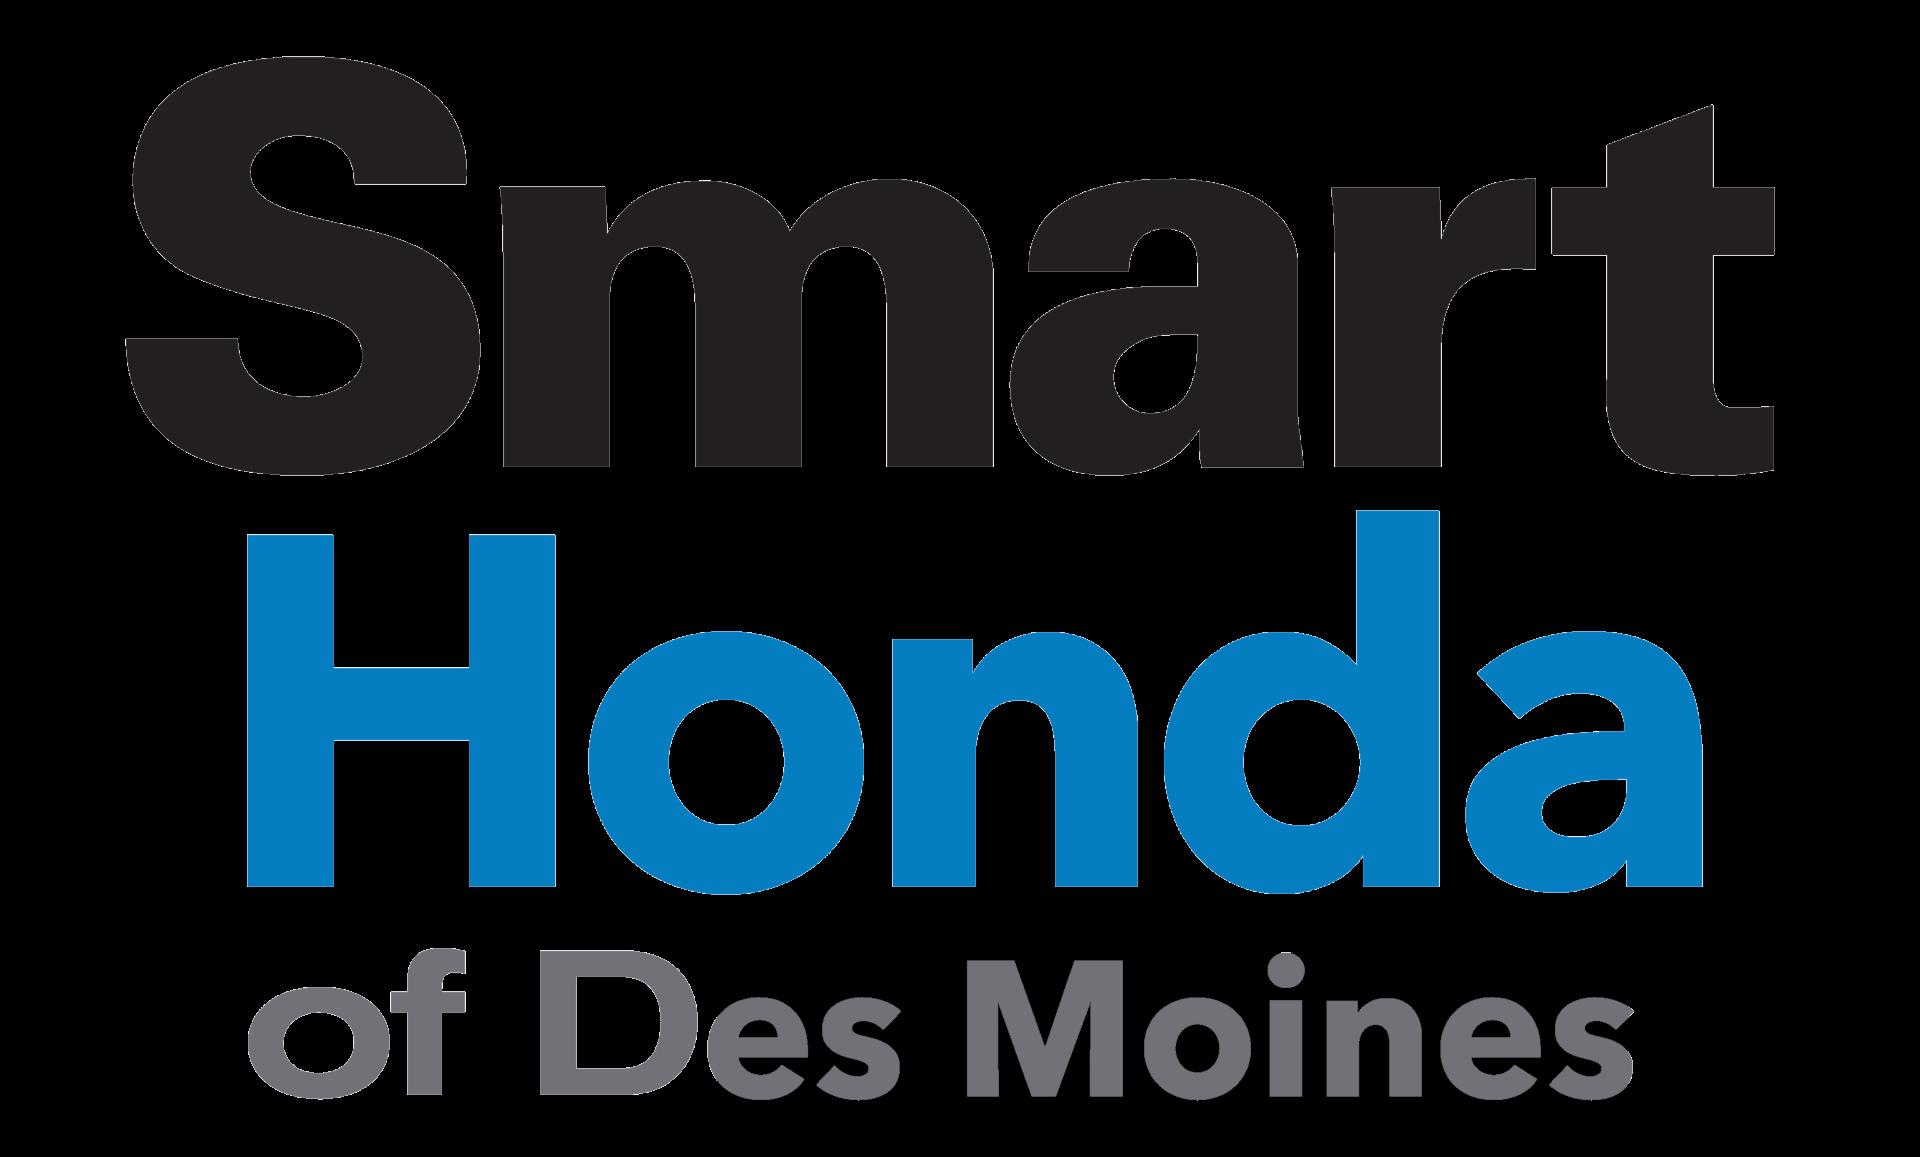 Smart Honda of Des Moines